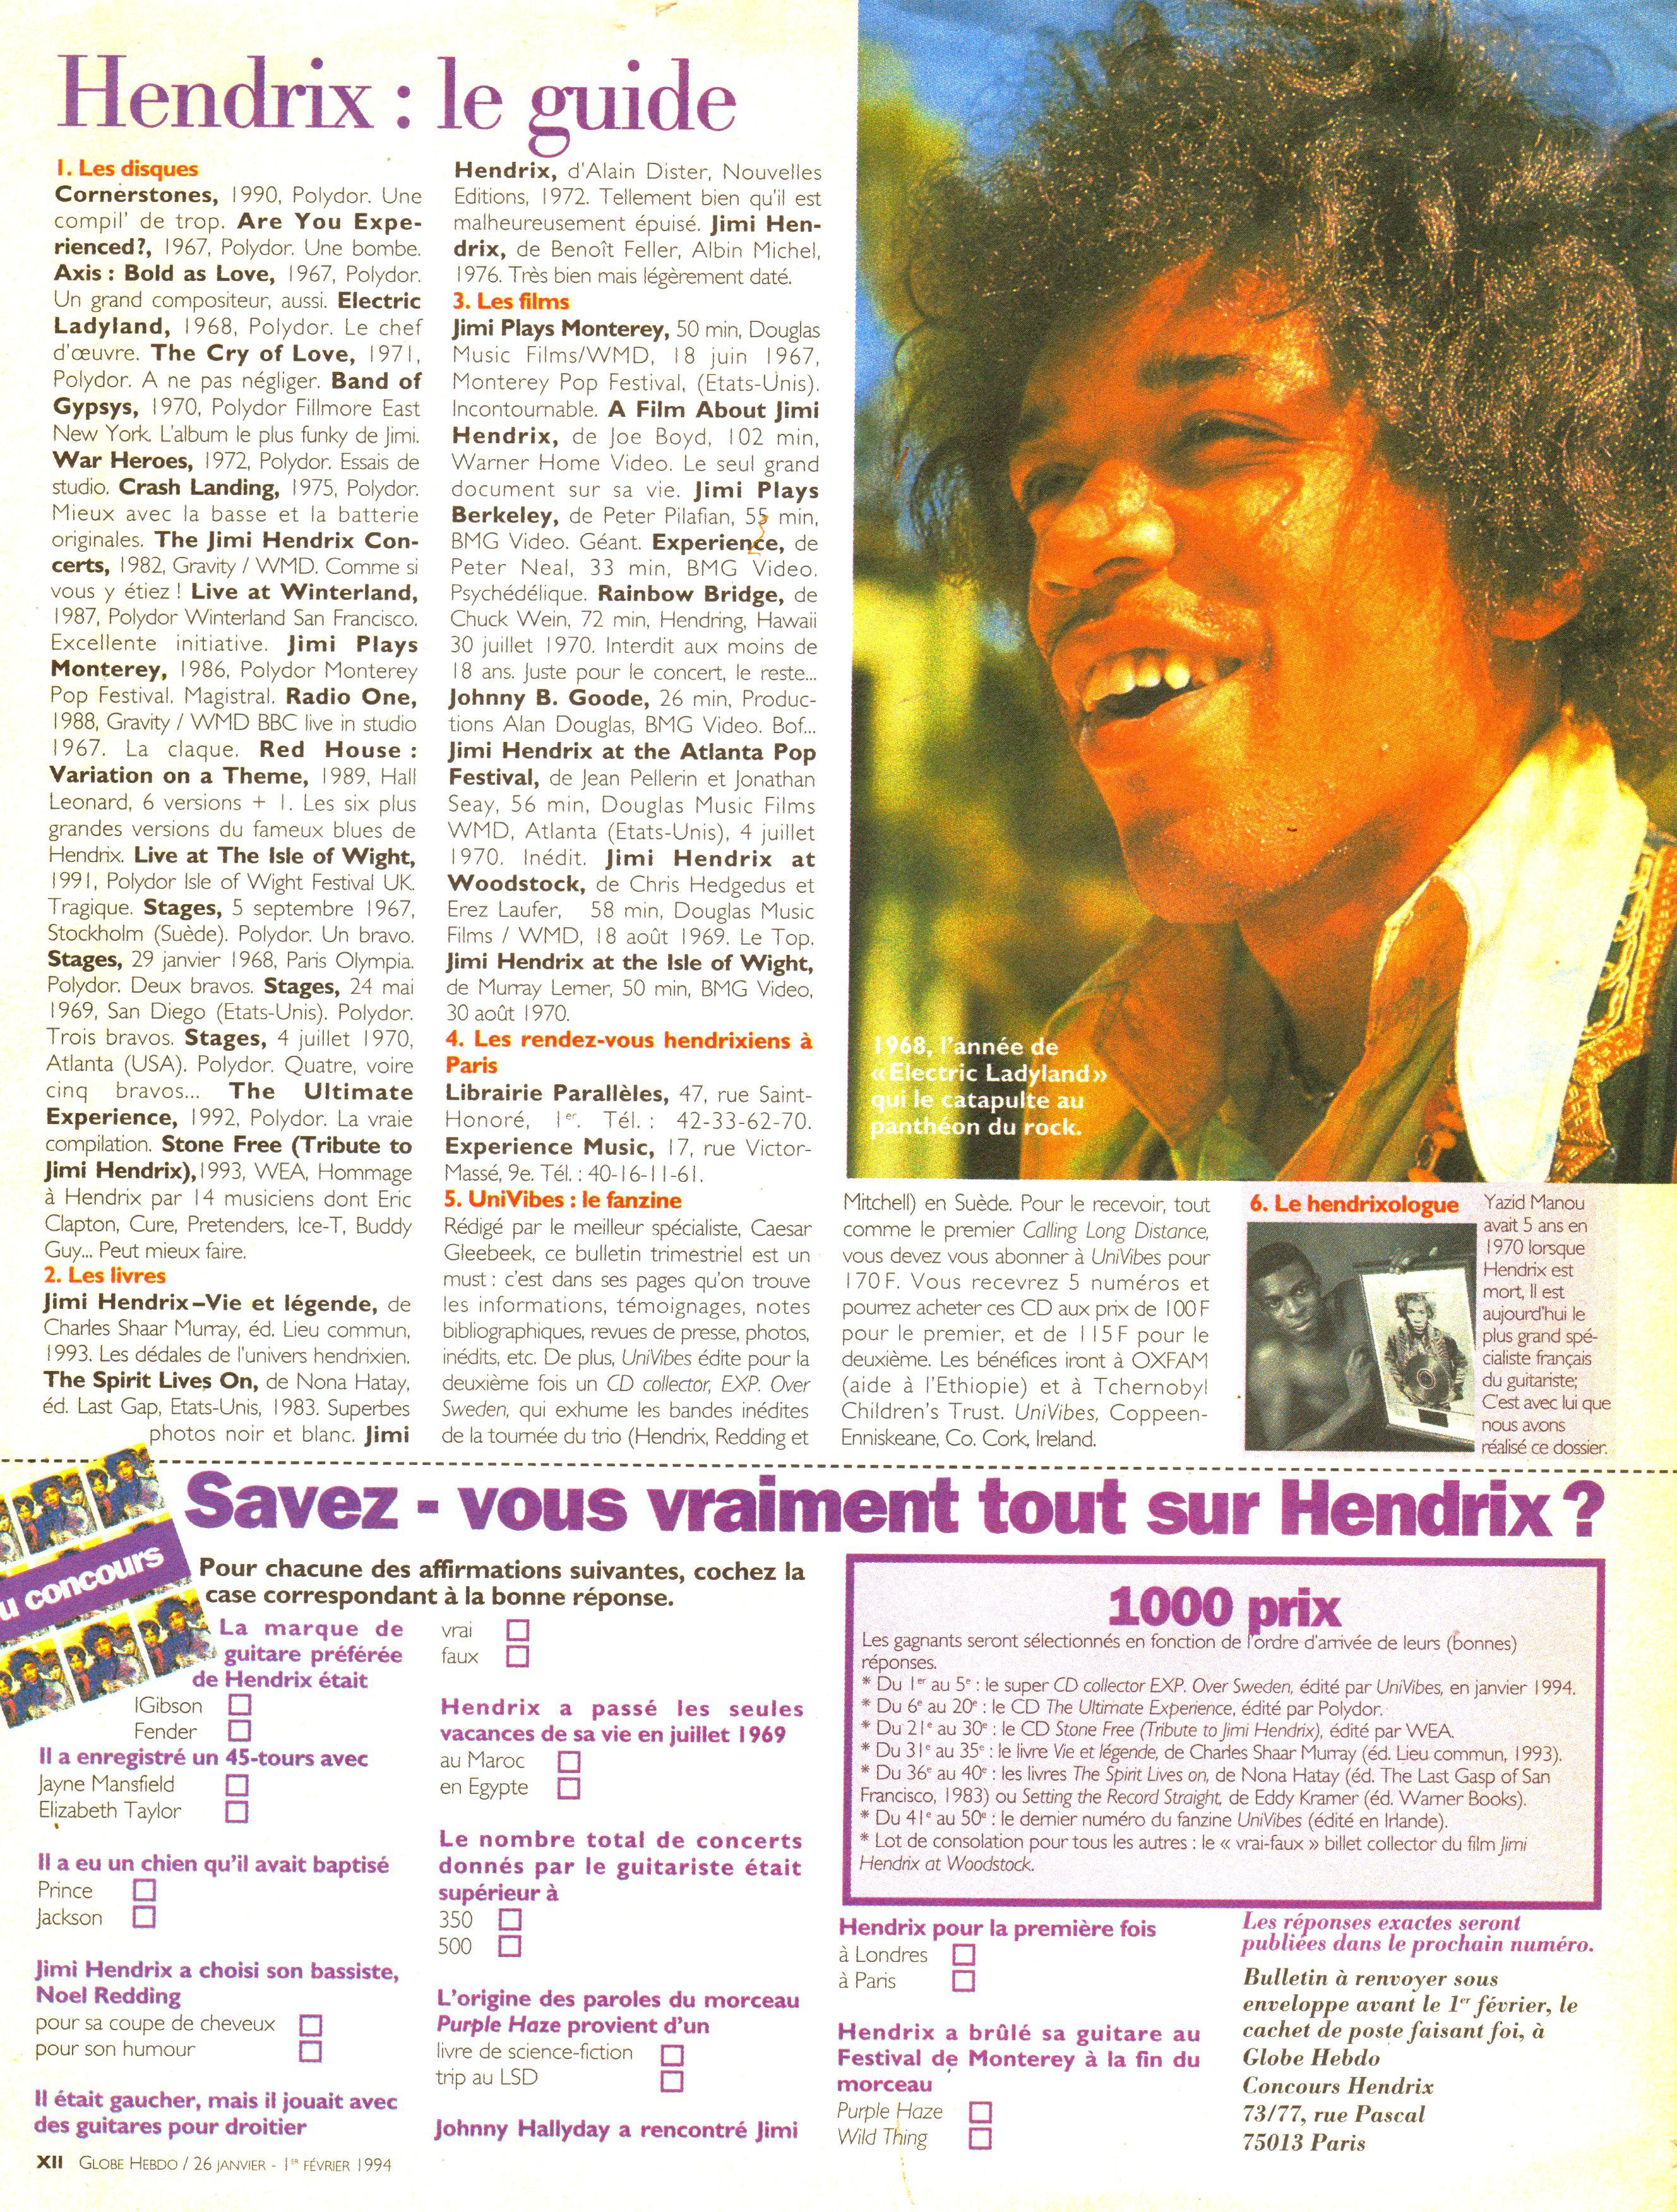 Magazines Français 1989 - 2014 GlobeHebdo26Janvier1reFevrier1994Page11